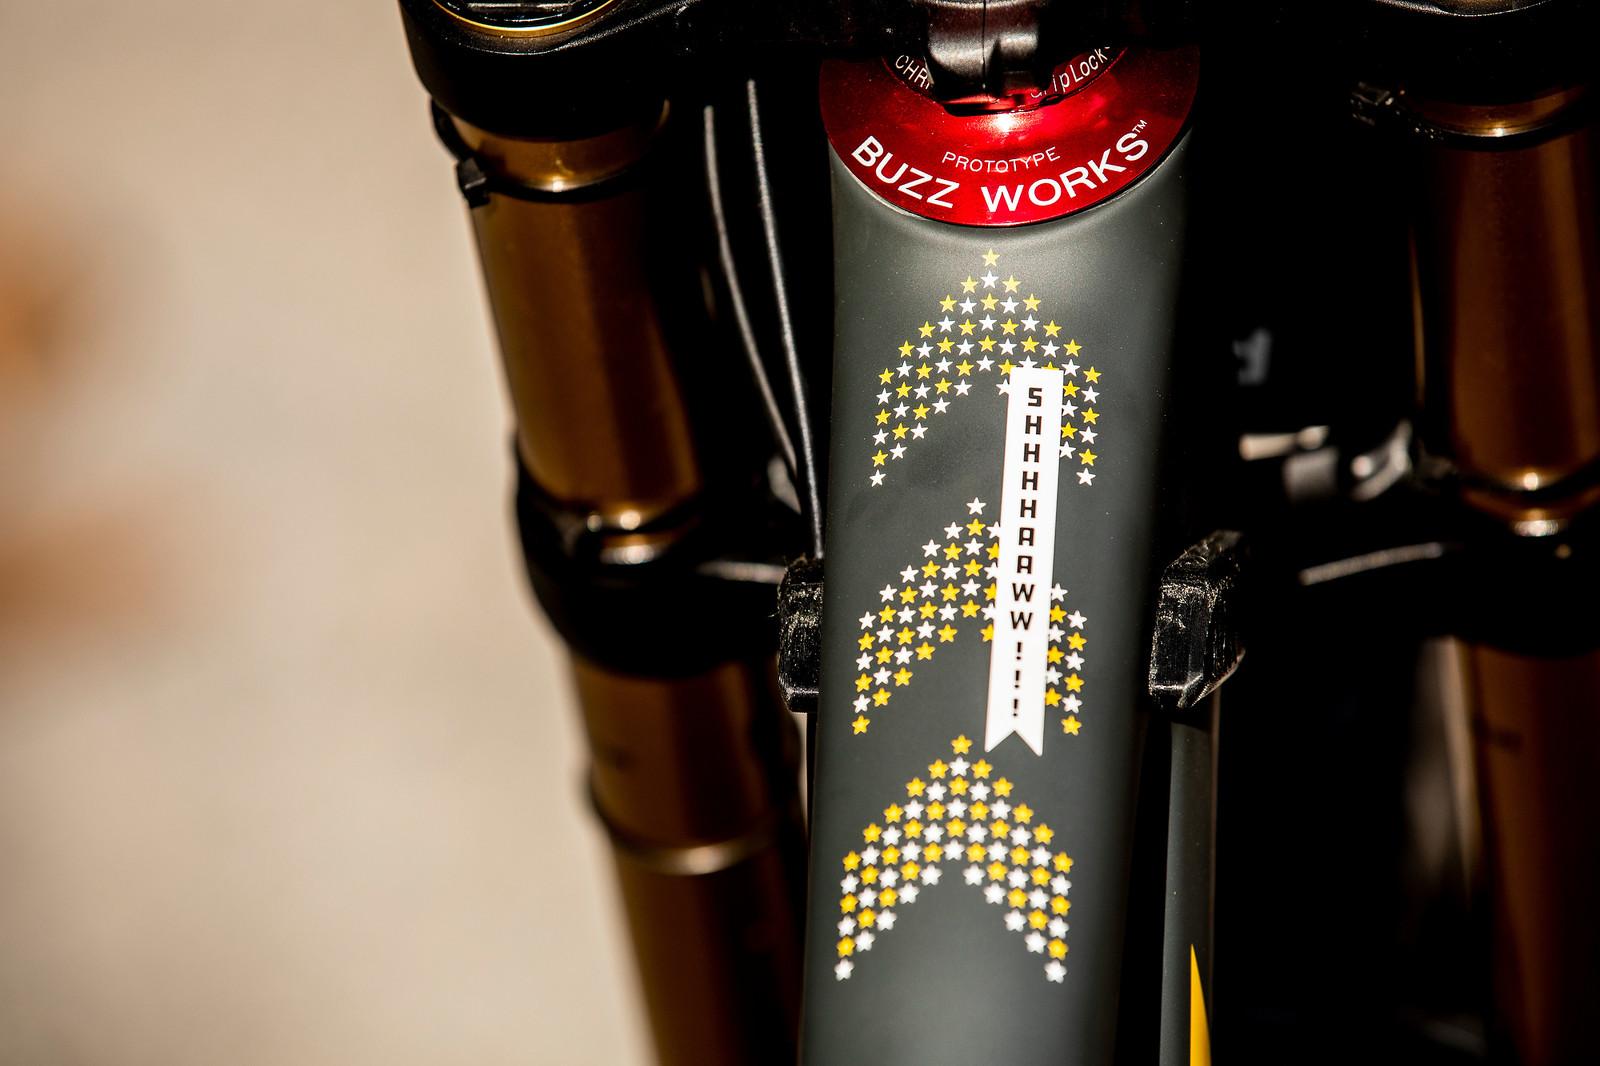 Shhhhaaaawww!! - WORLD CHAMPS BIKE - Luca Shaw's Santa Cruz V10 - Mountain Biking Pictures - Vital MTB